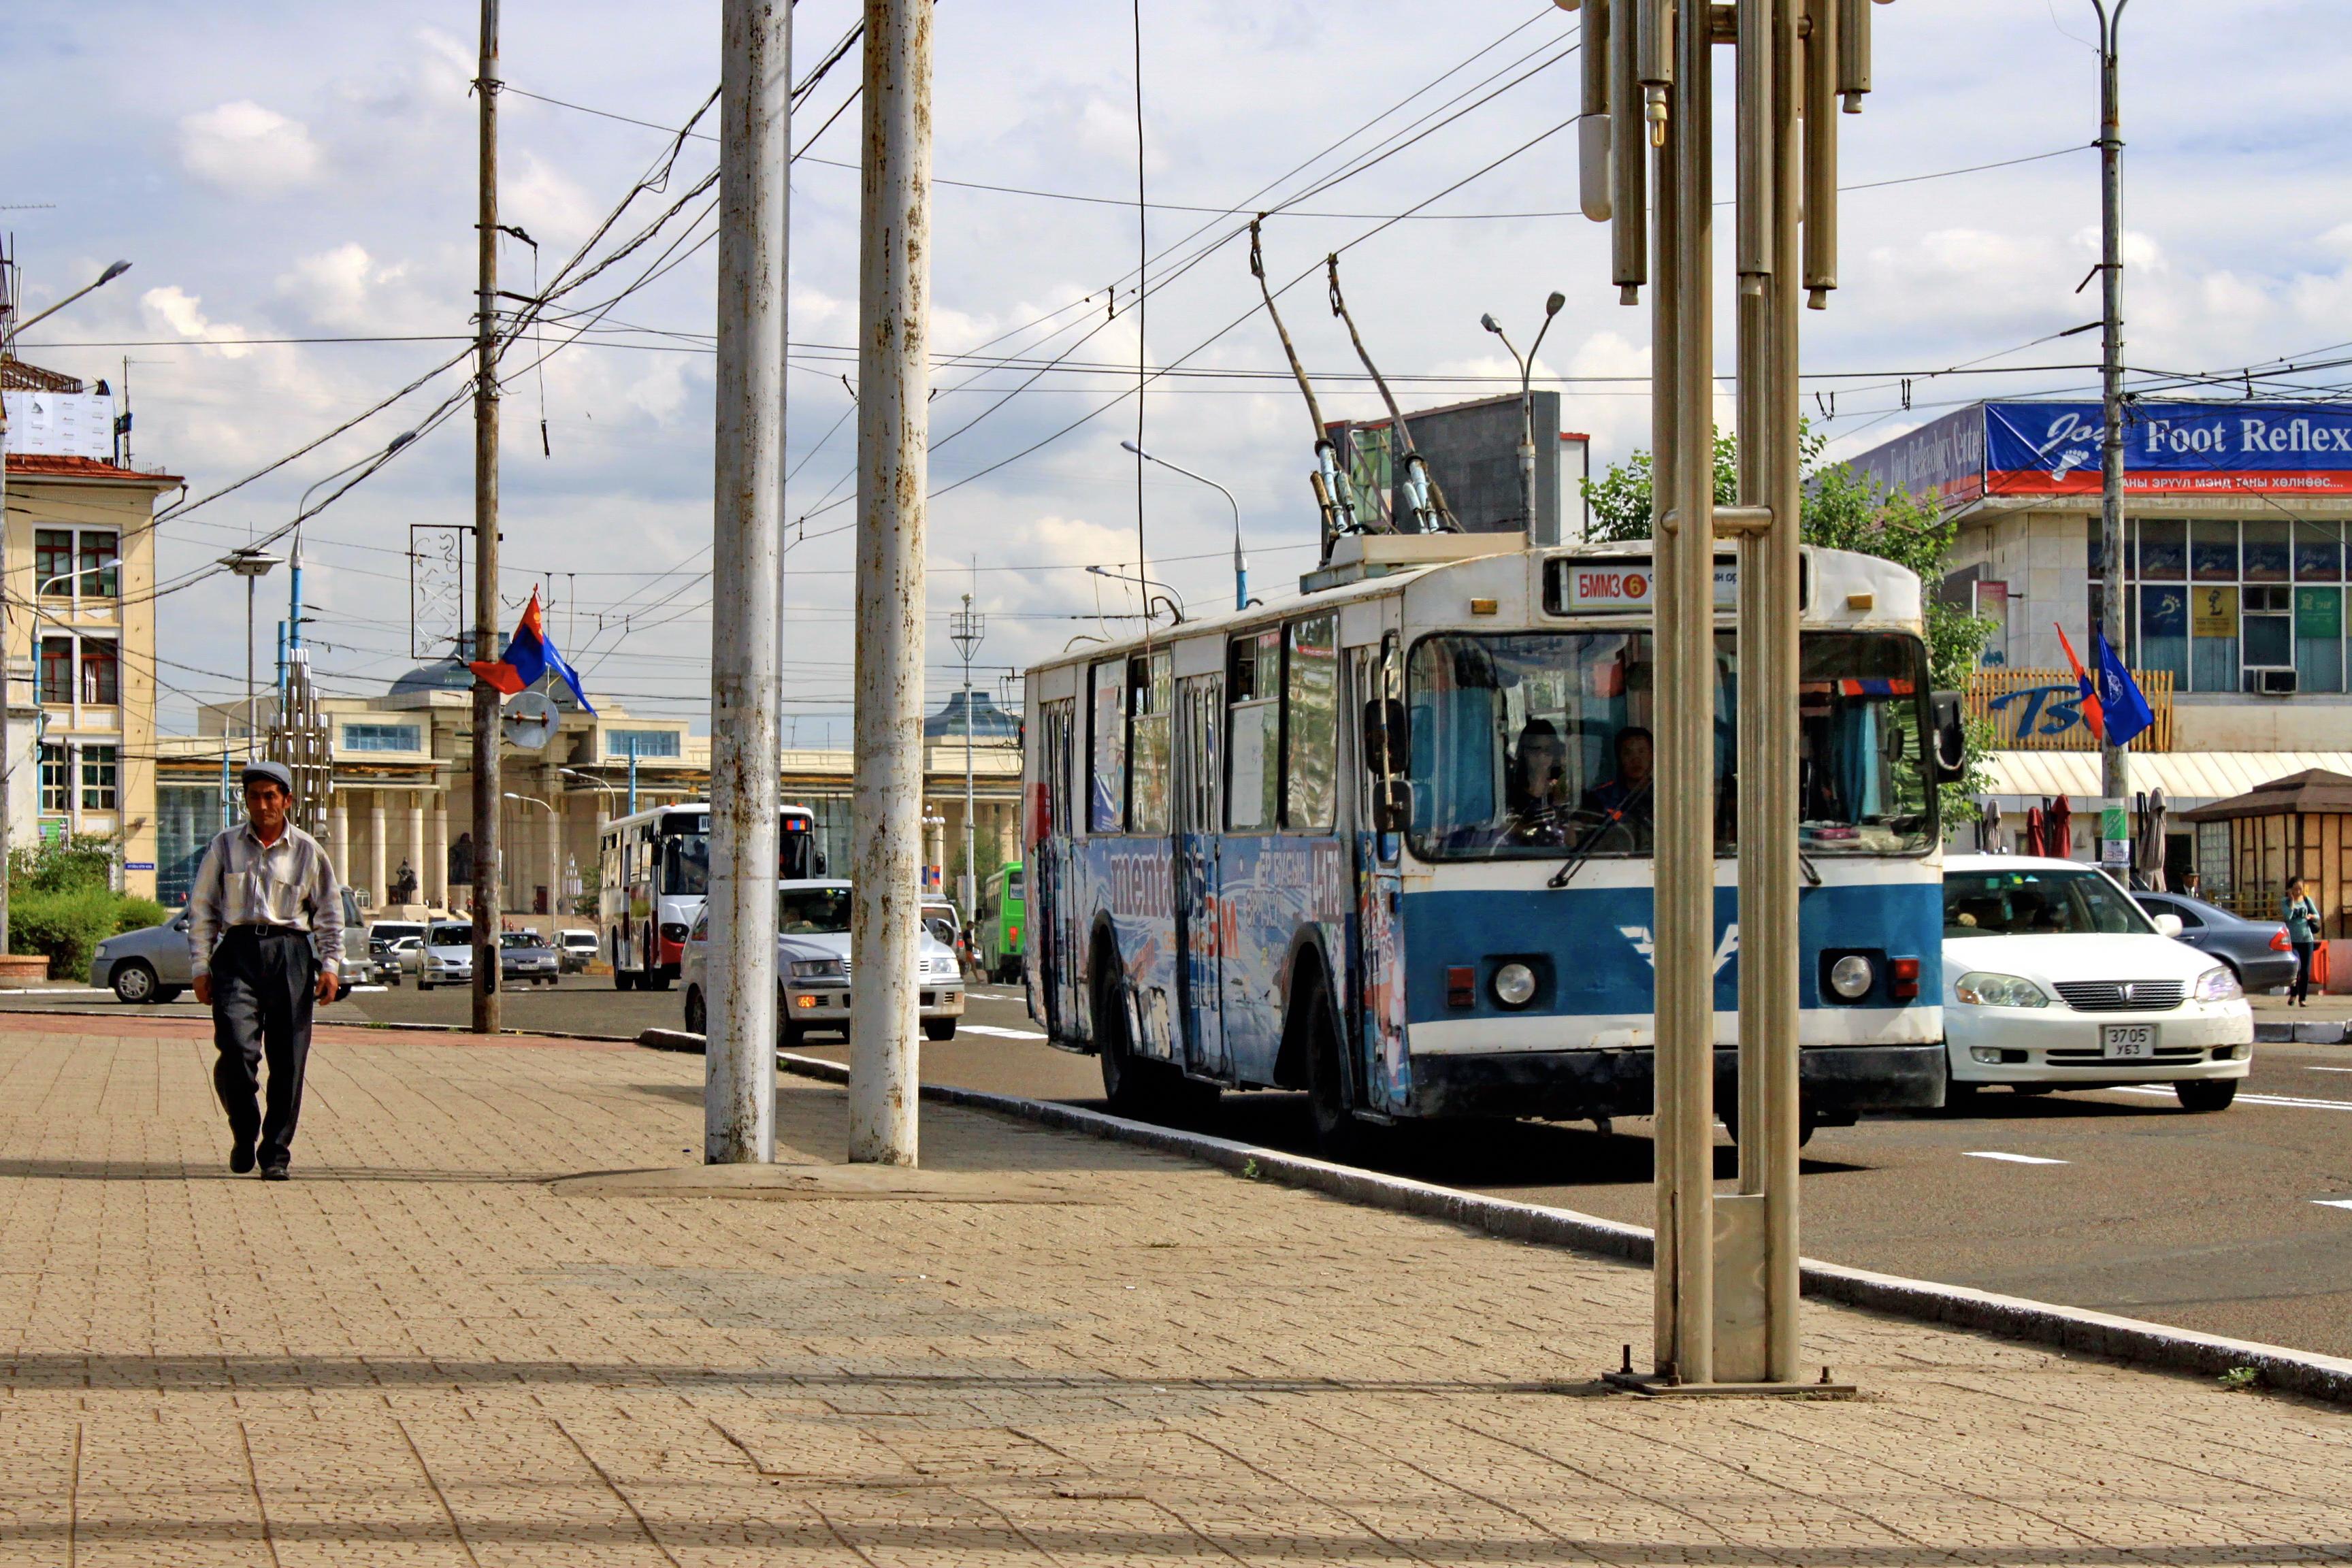 Ulica w centrum Ułan Bator 01.JPG